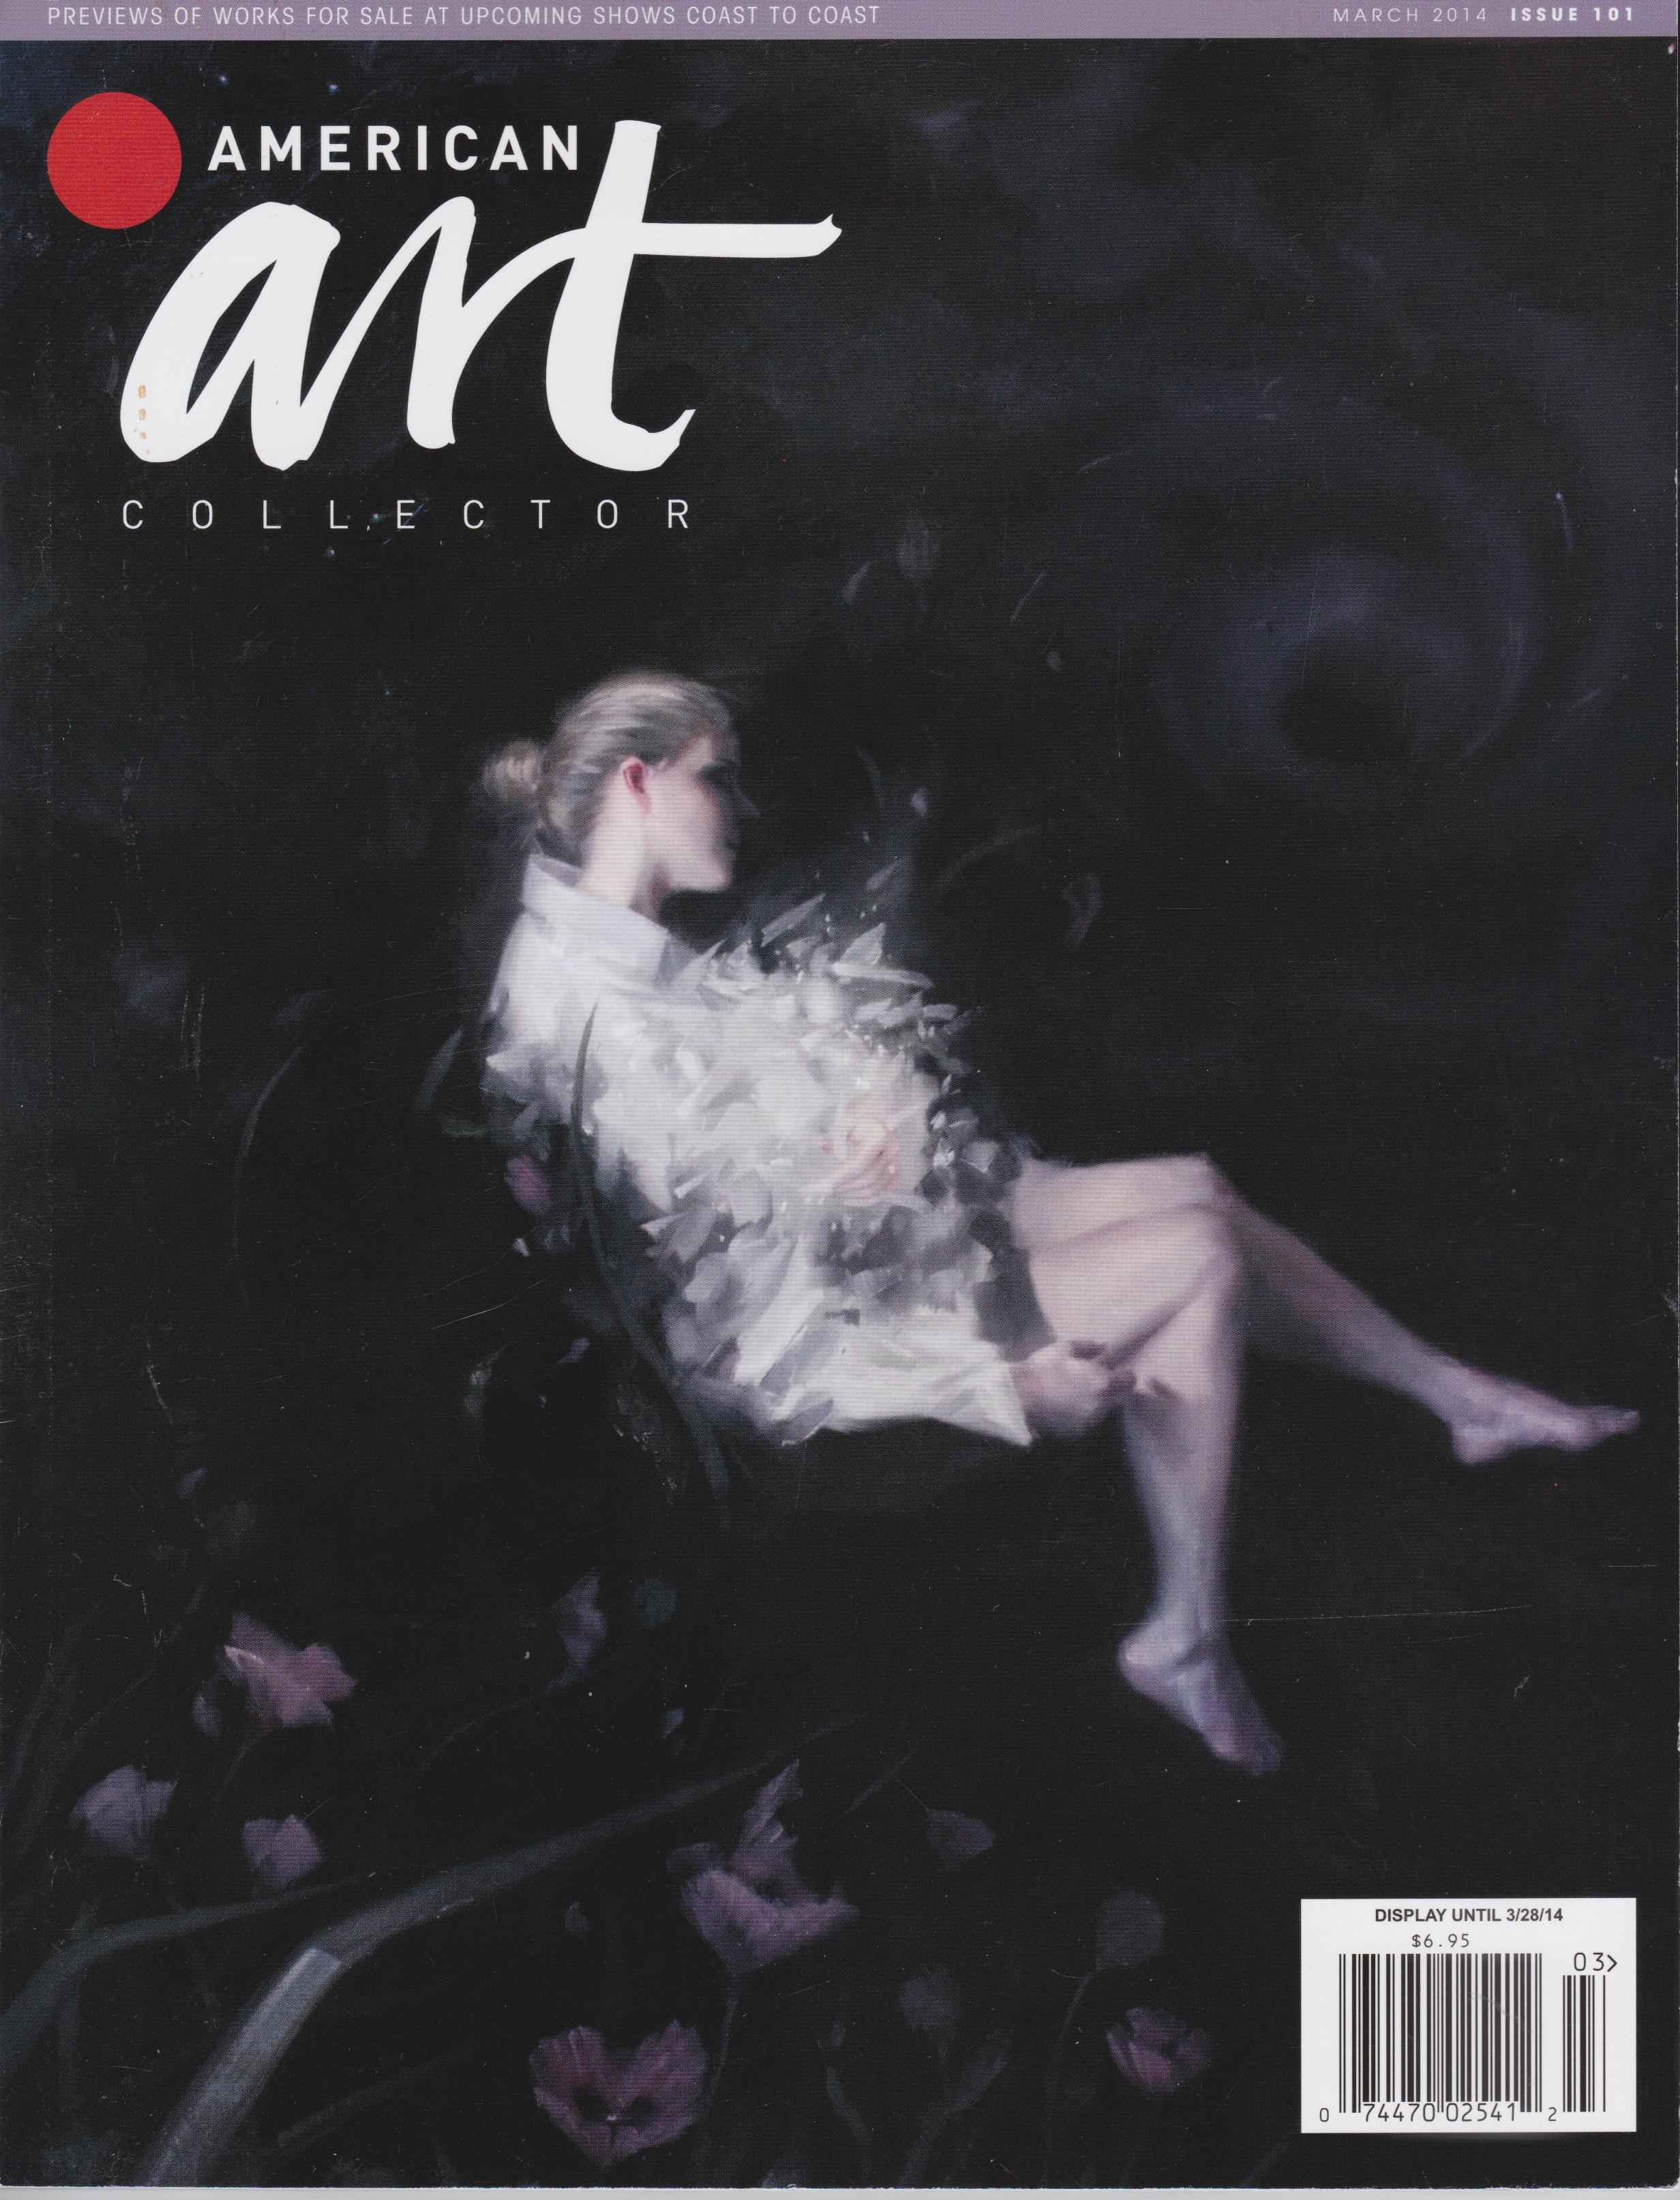 American Art Collector cover.jpg